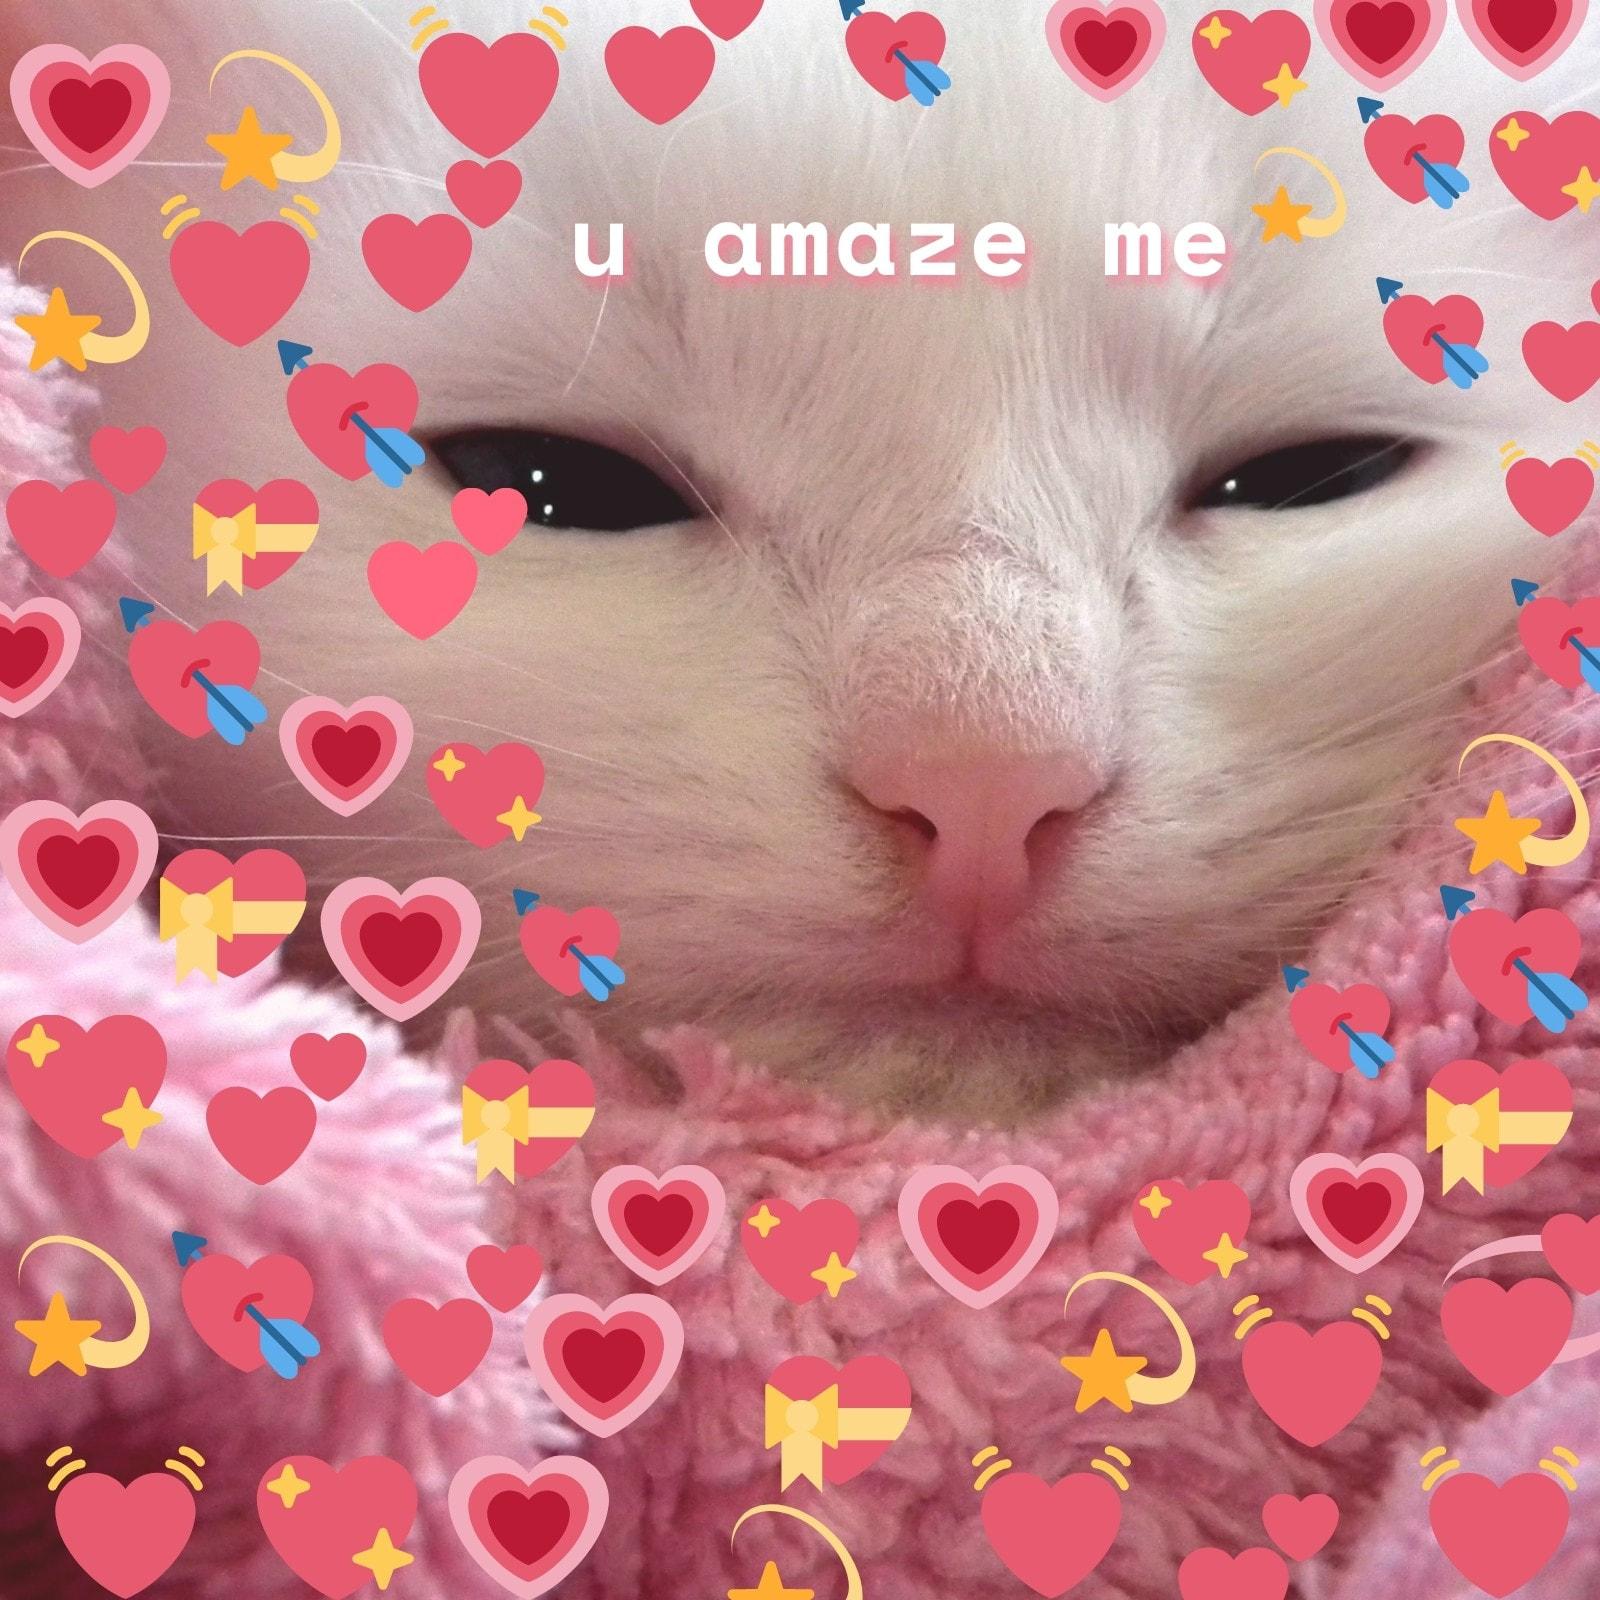 Cat Emoji Bomb Square Animal Meme